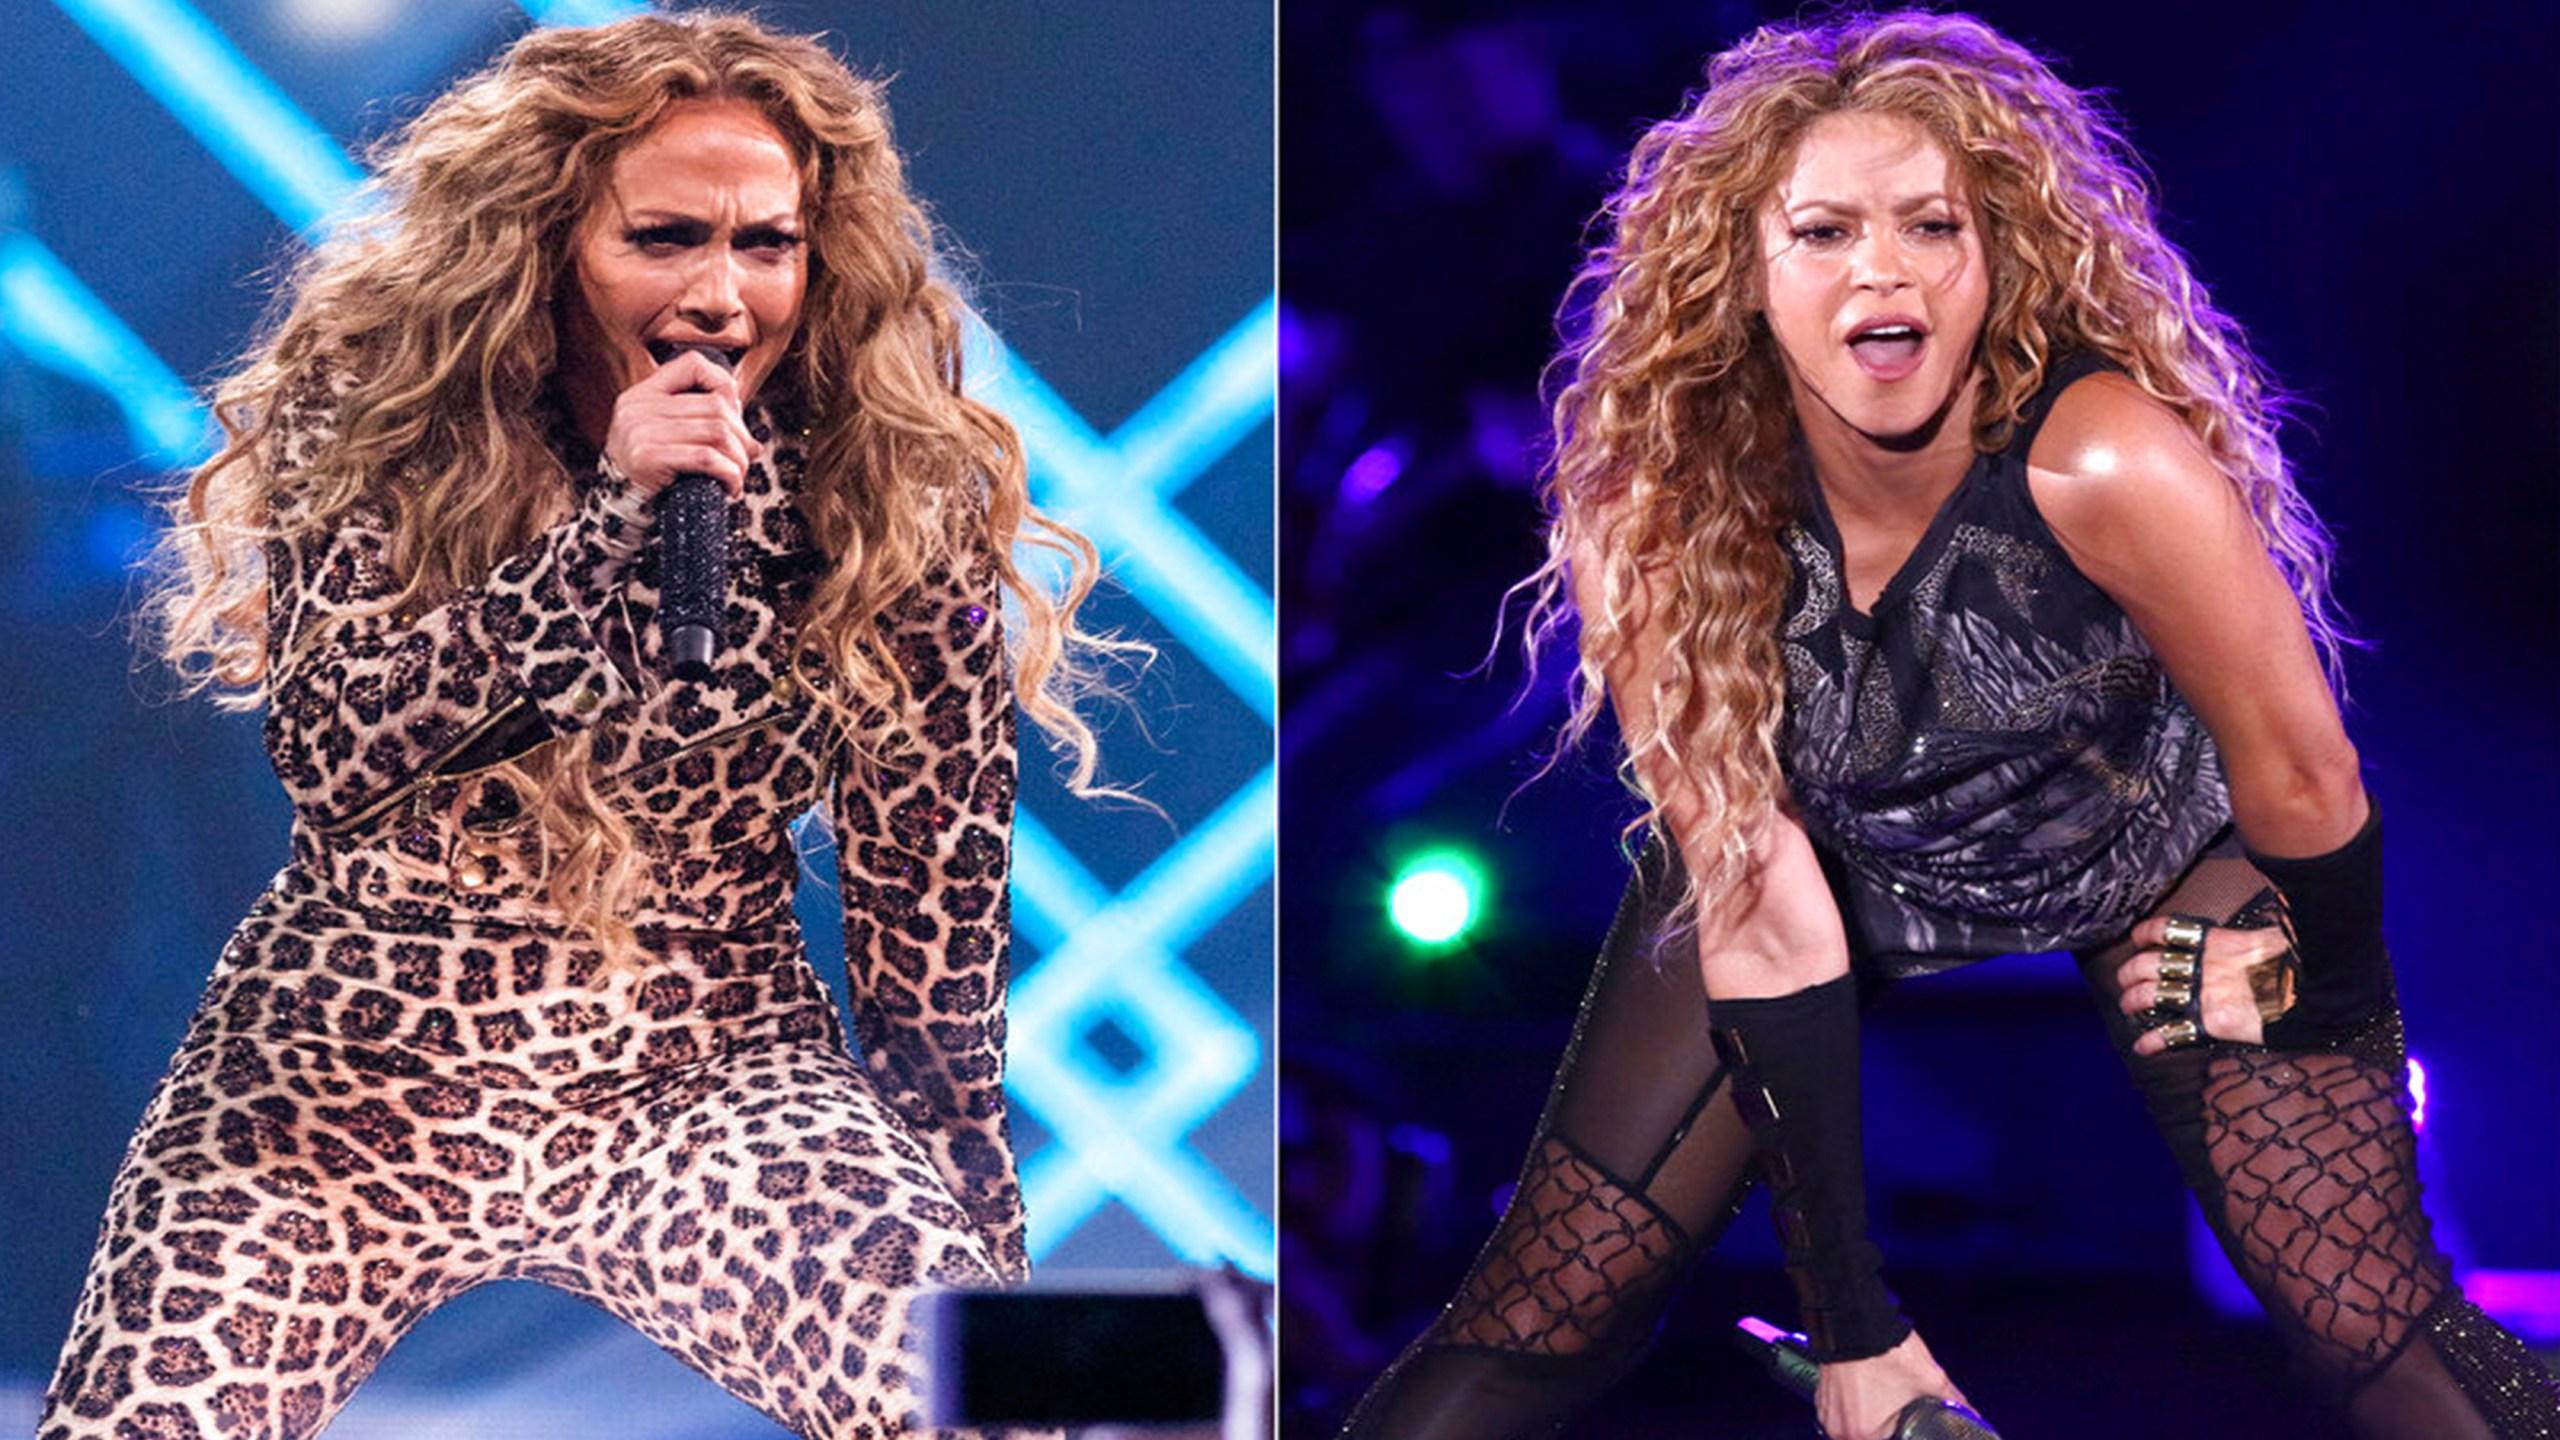 J Lo and Shakira halftime show